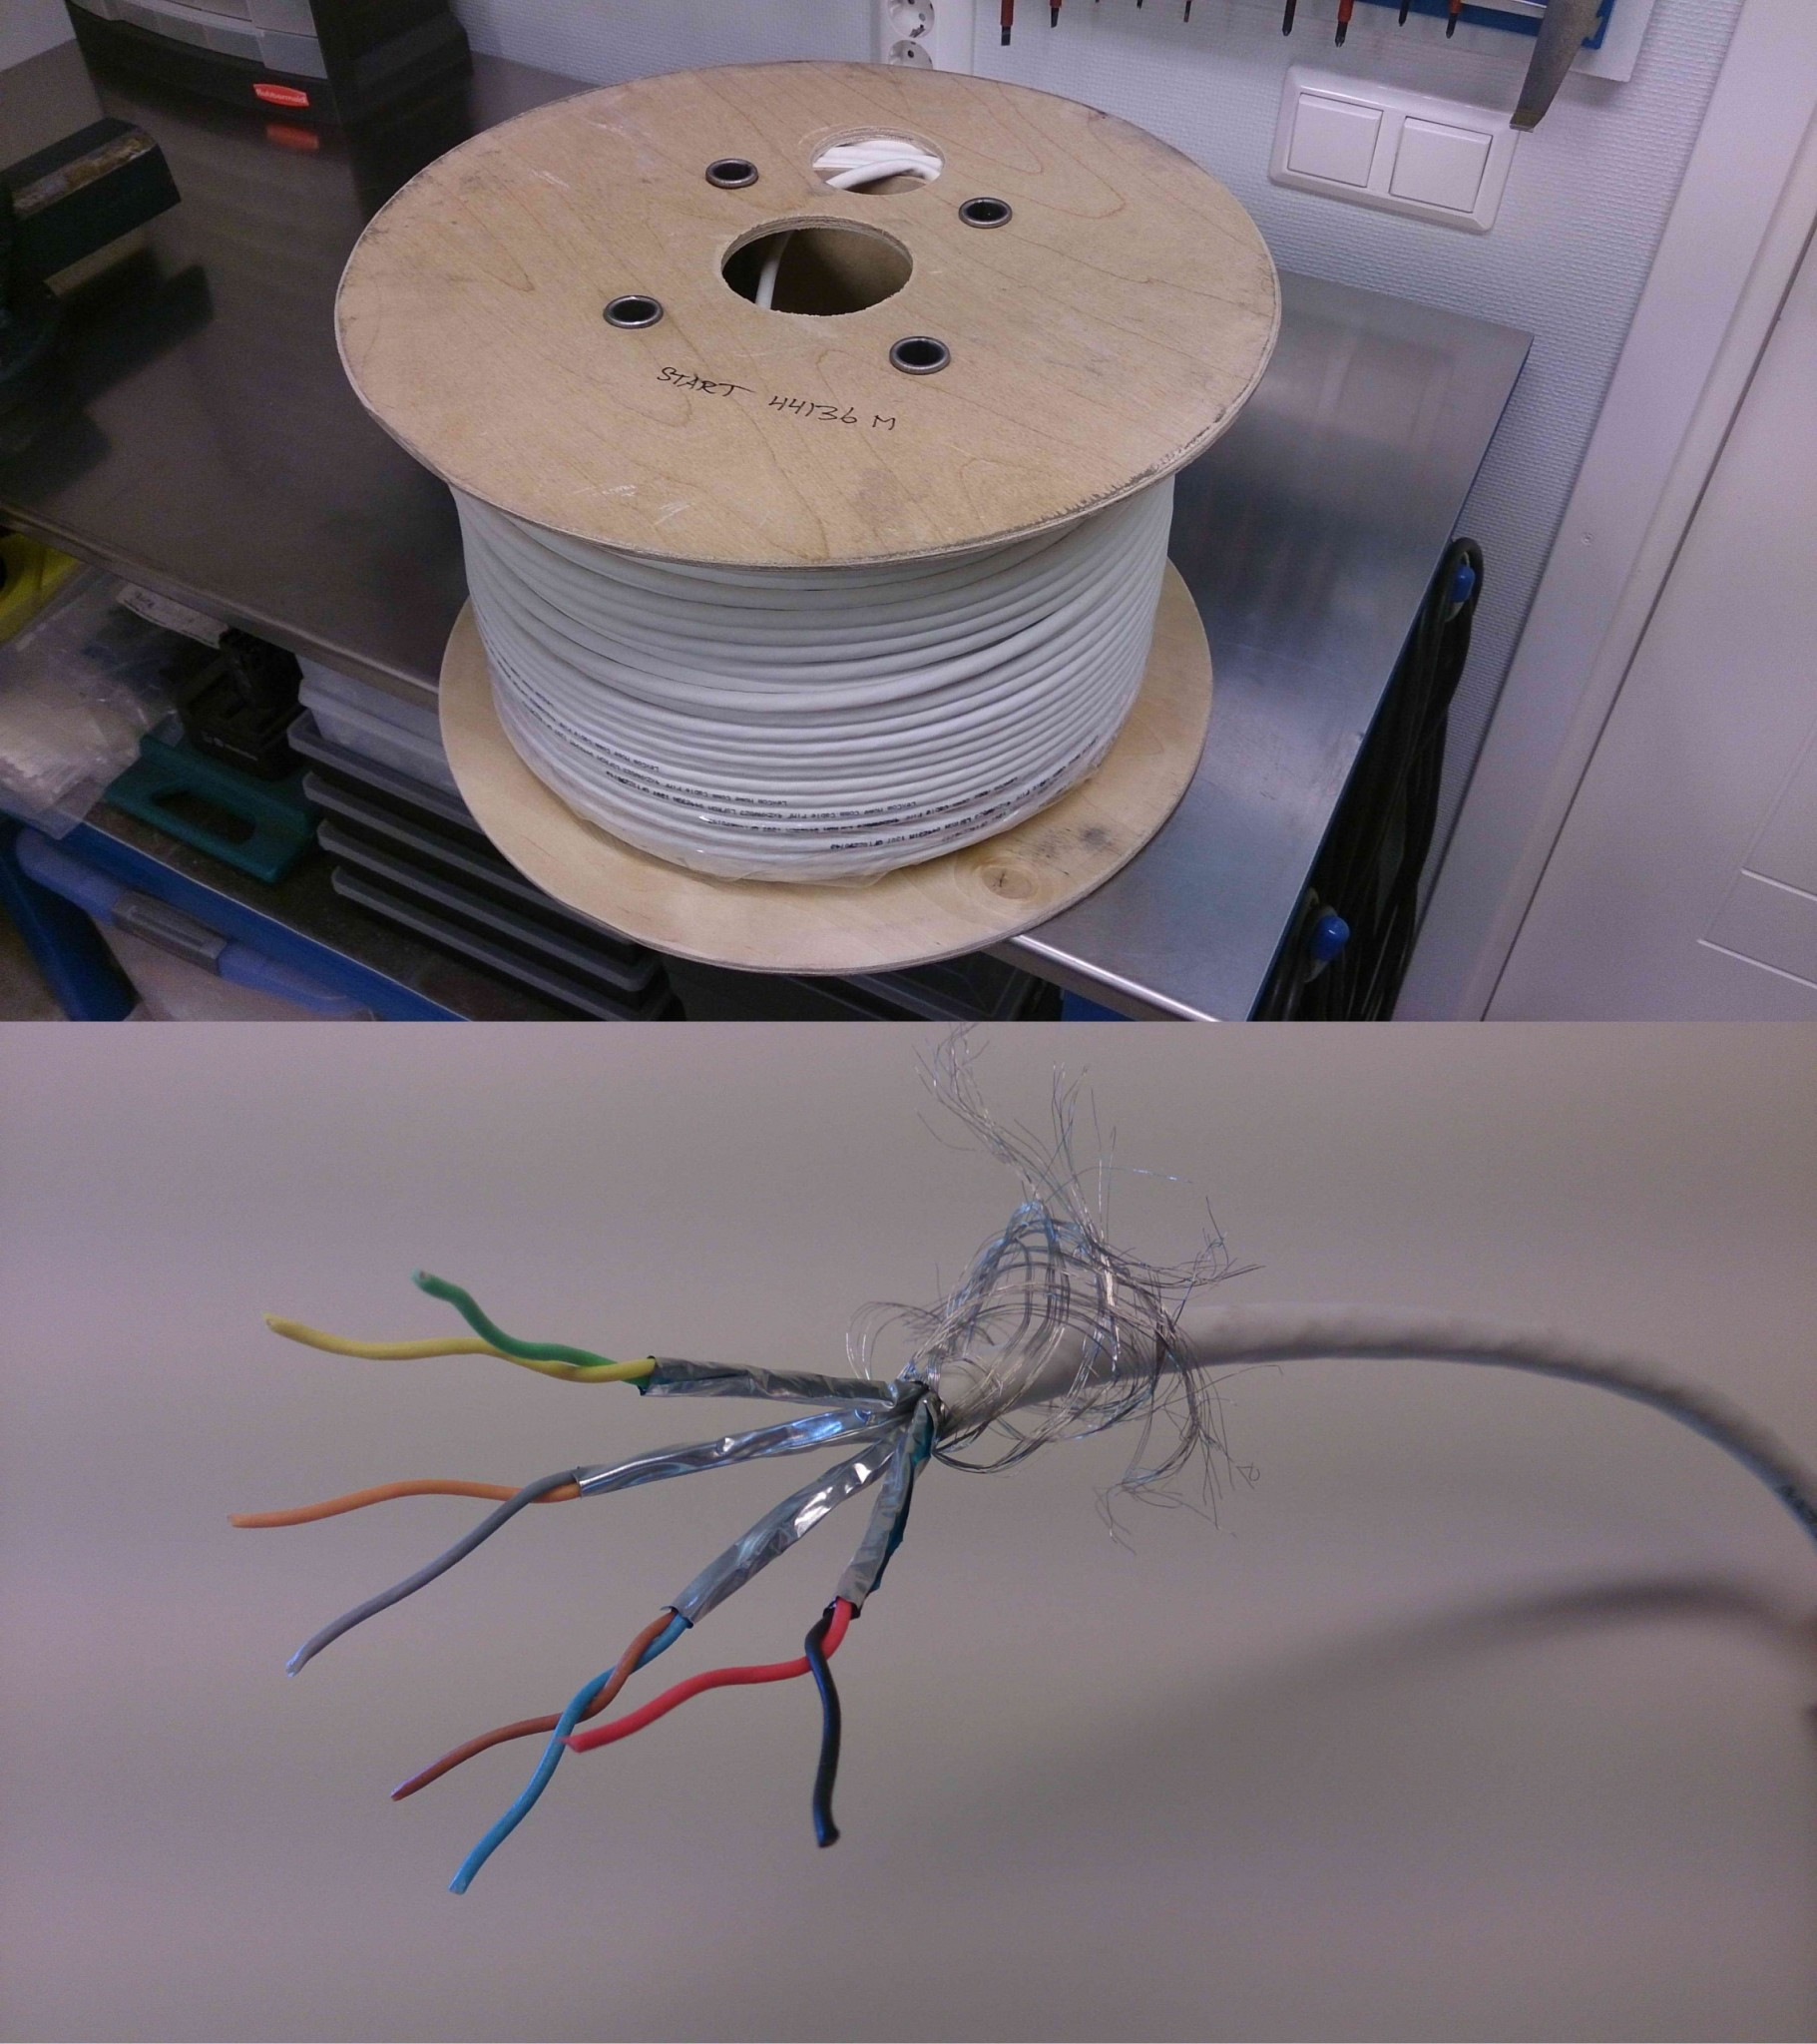 kabel fast installation inomhus